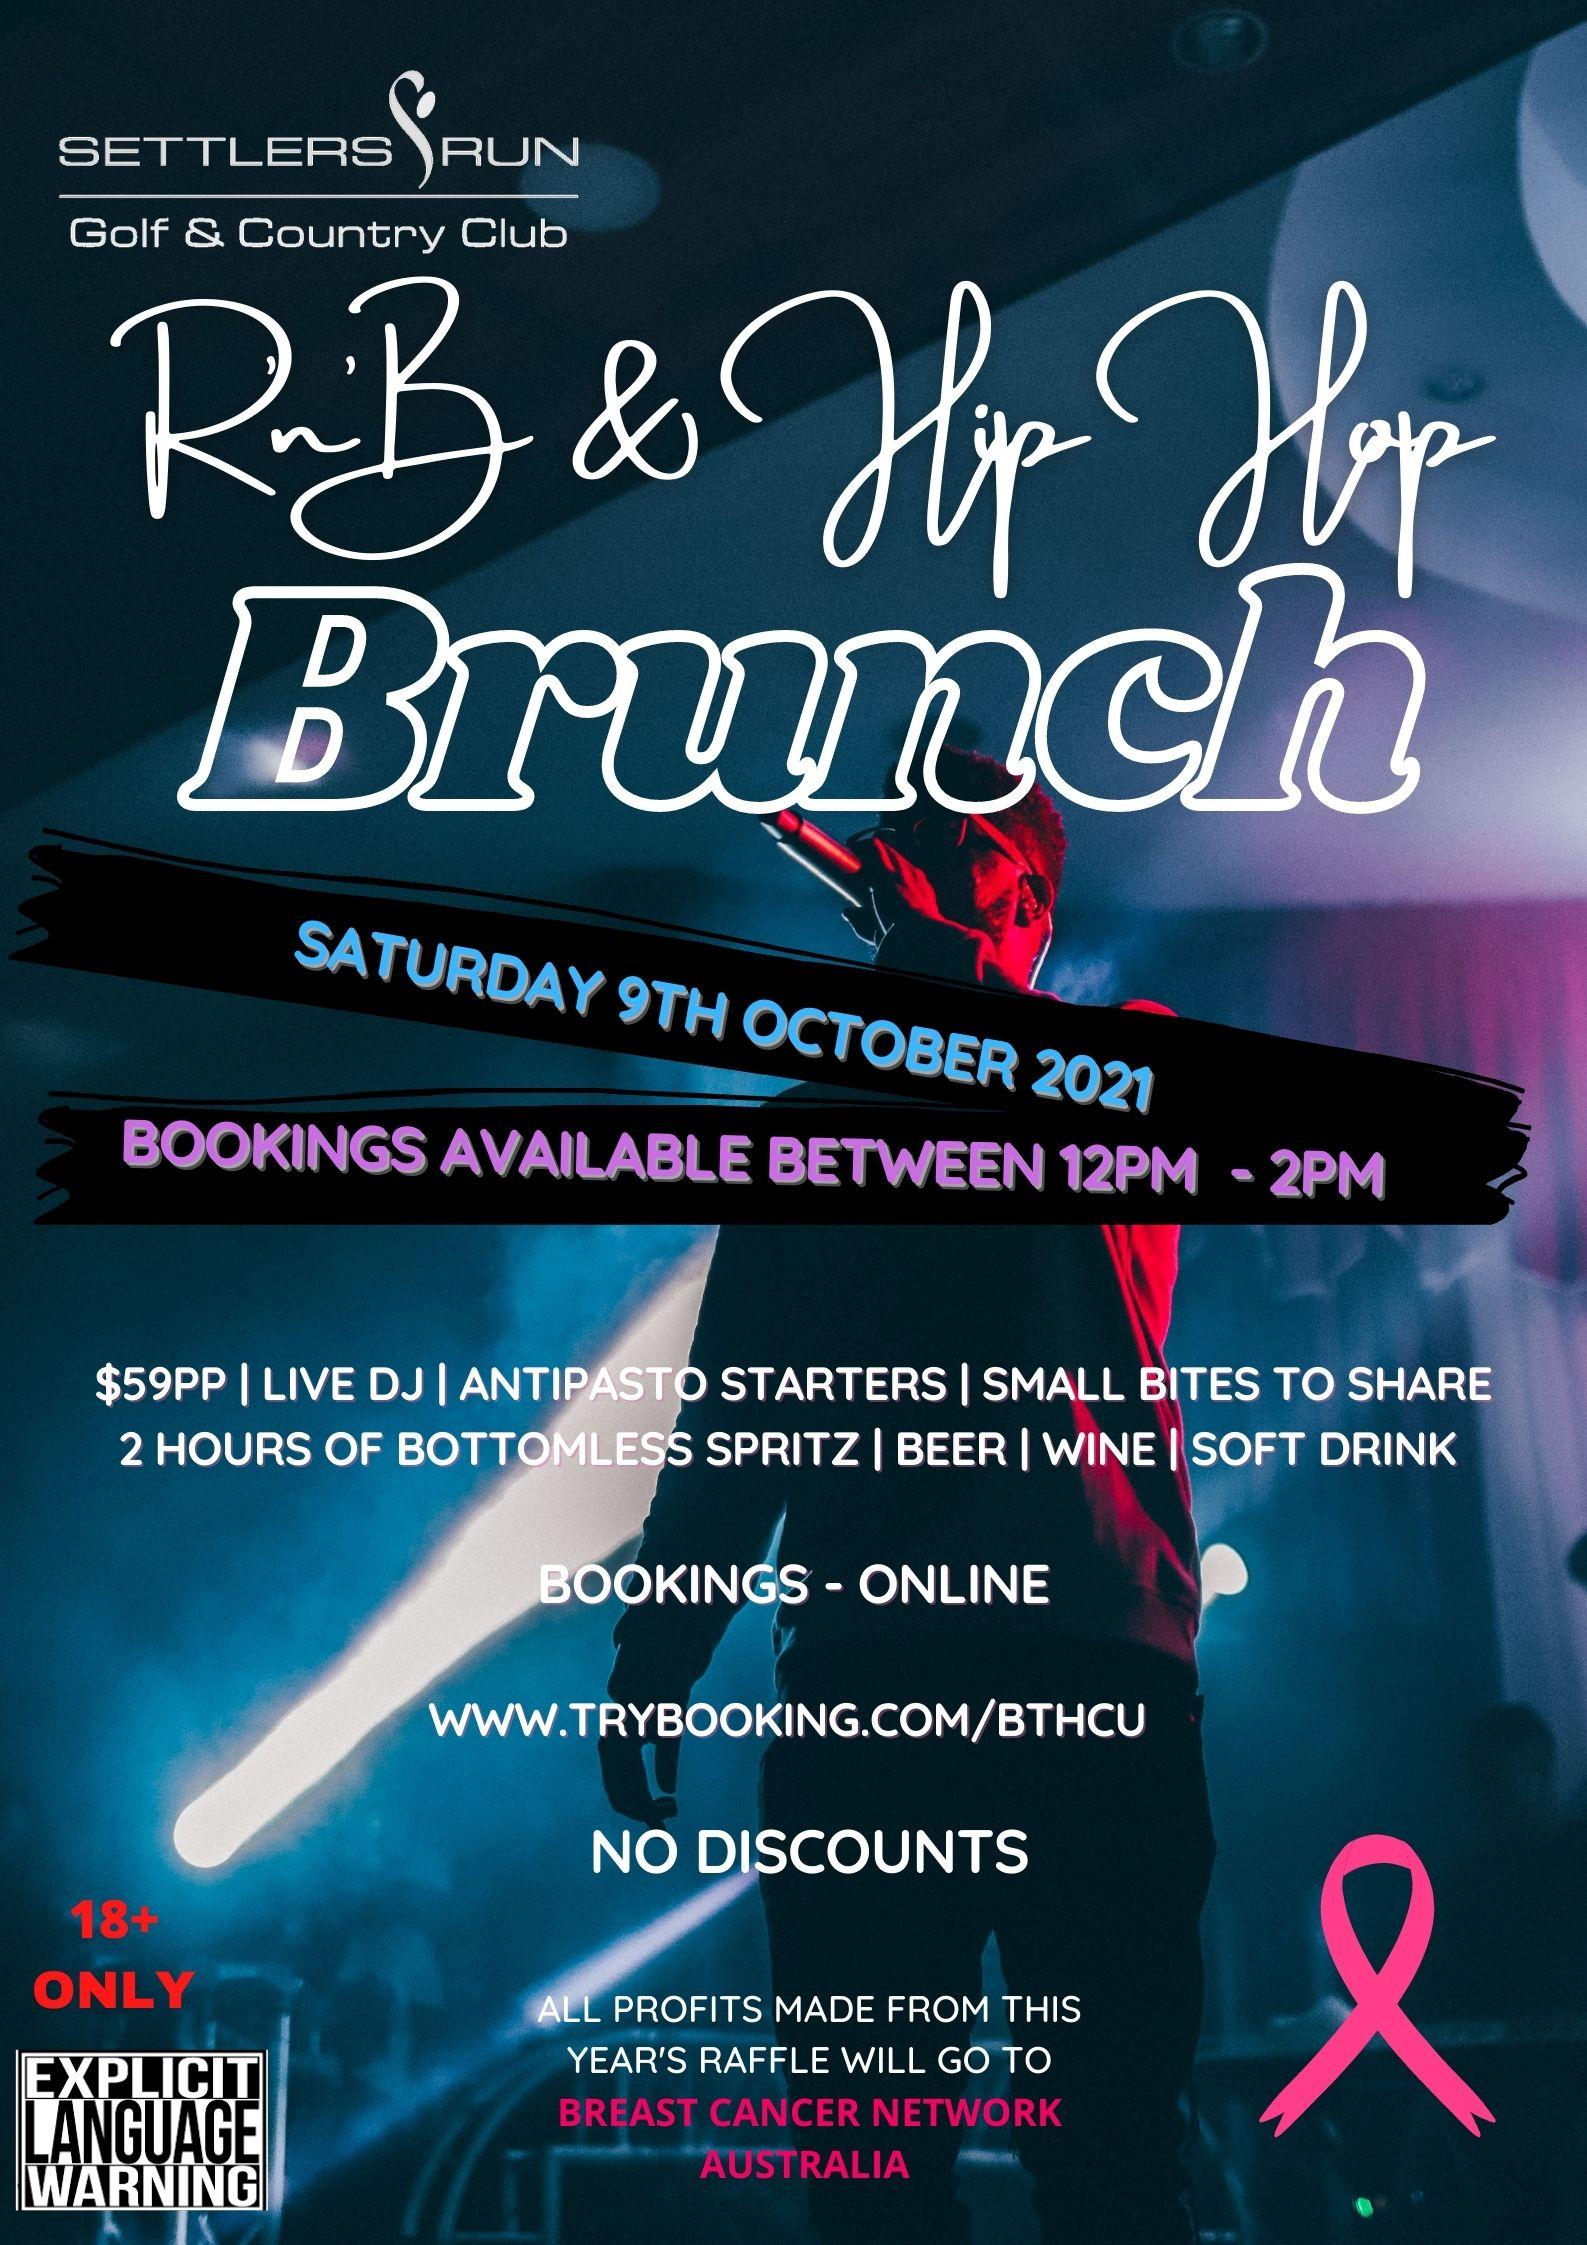 R'n'B & Hip Hop Brunch POSTPONED